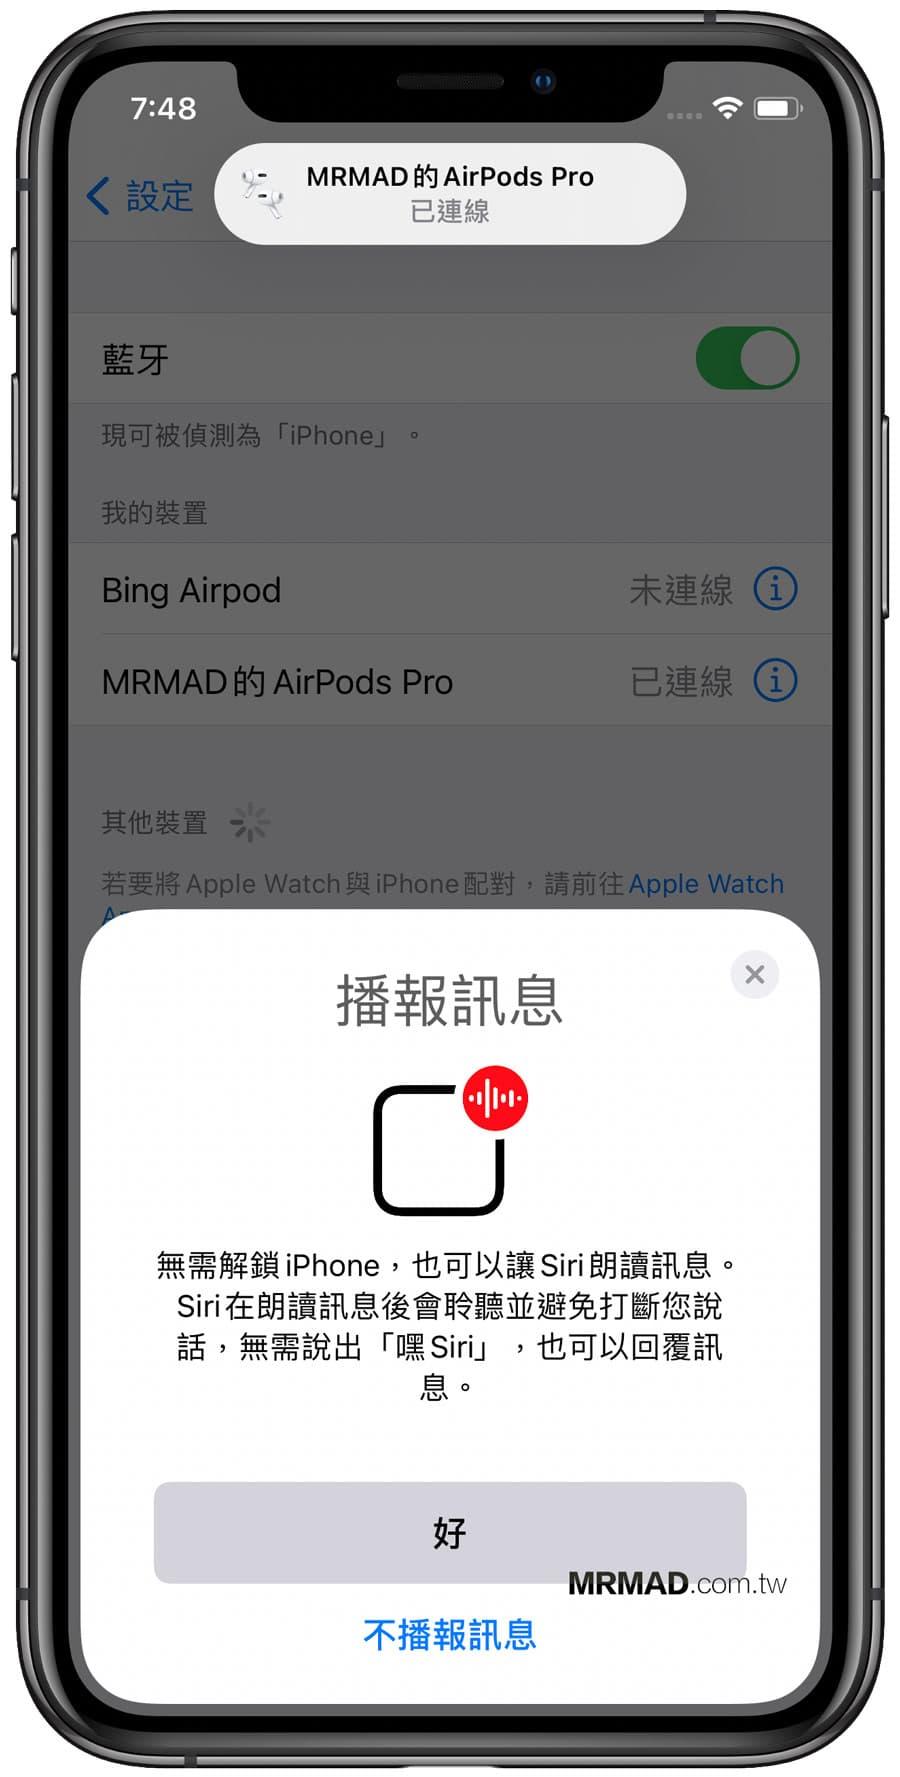 AirPods 連線提示與播報訊息